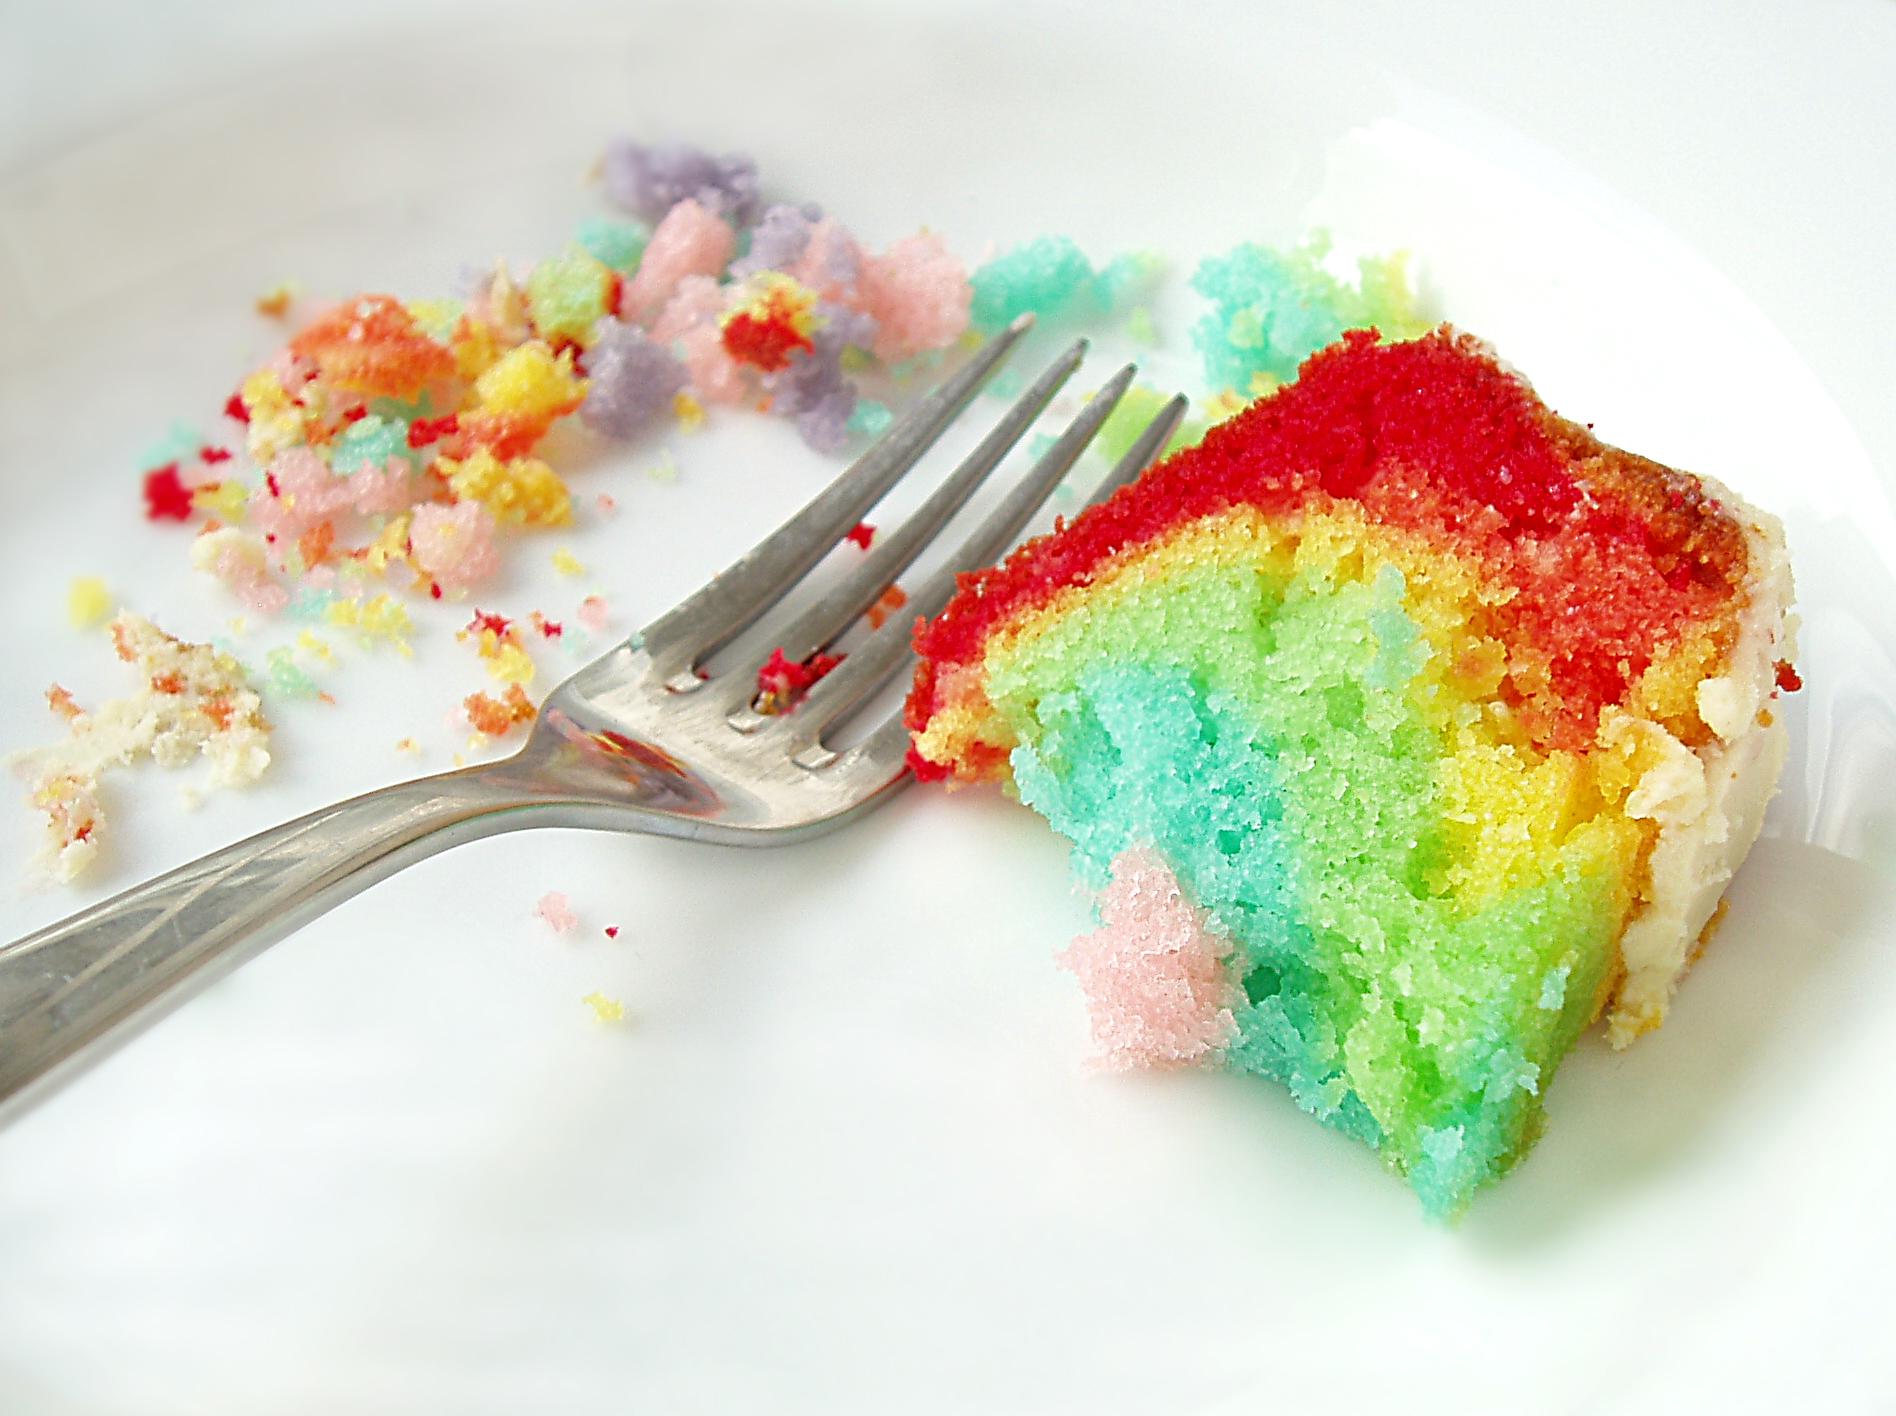 rainbow cake crumbs